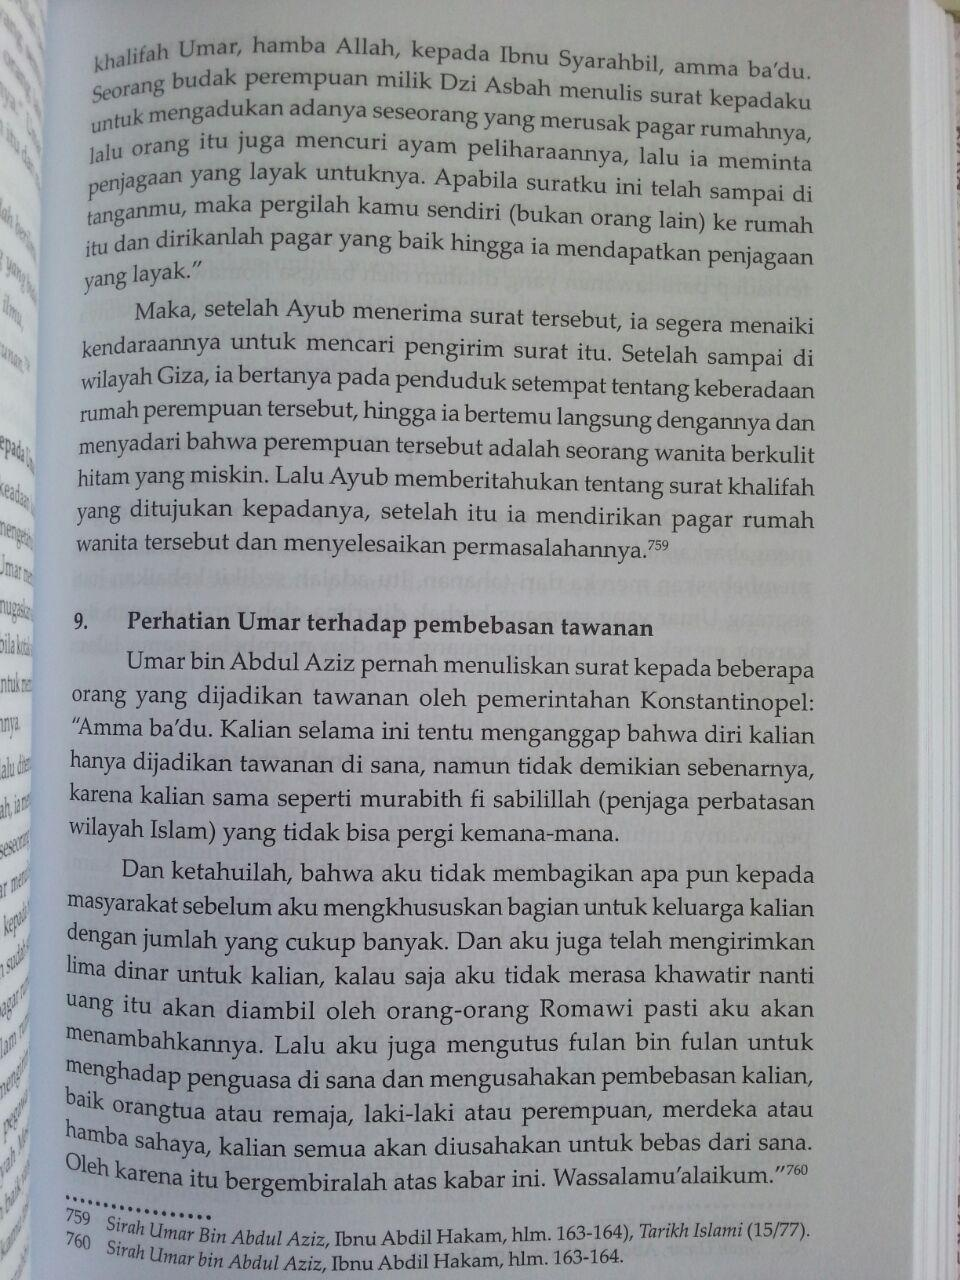 Buku Umar bin Abdul Aziz Khalifah Pembaru Dari Bani Umayyah isi 3